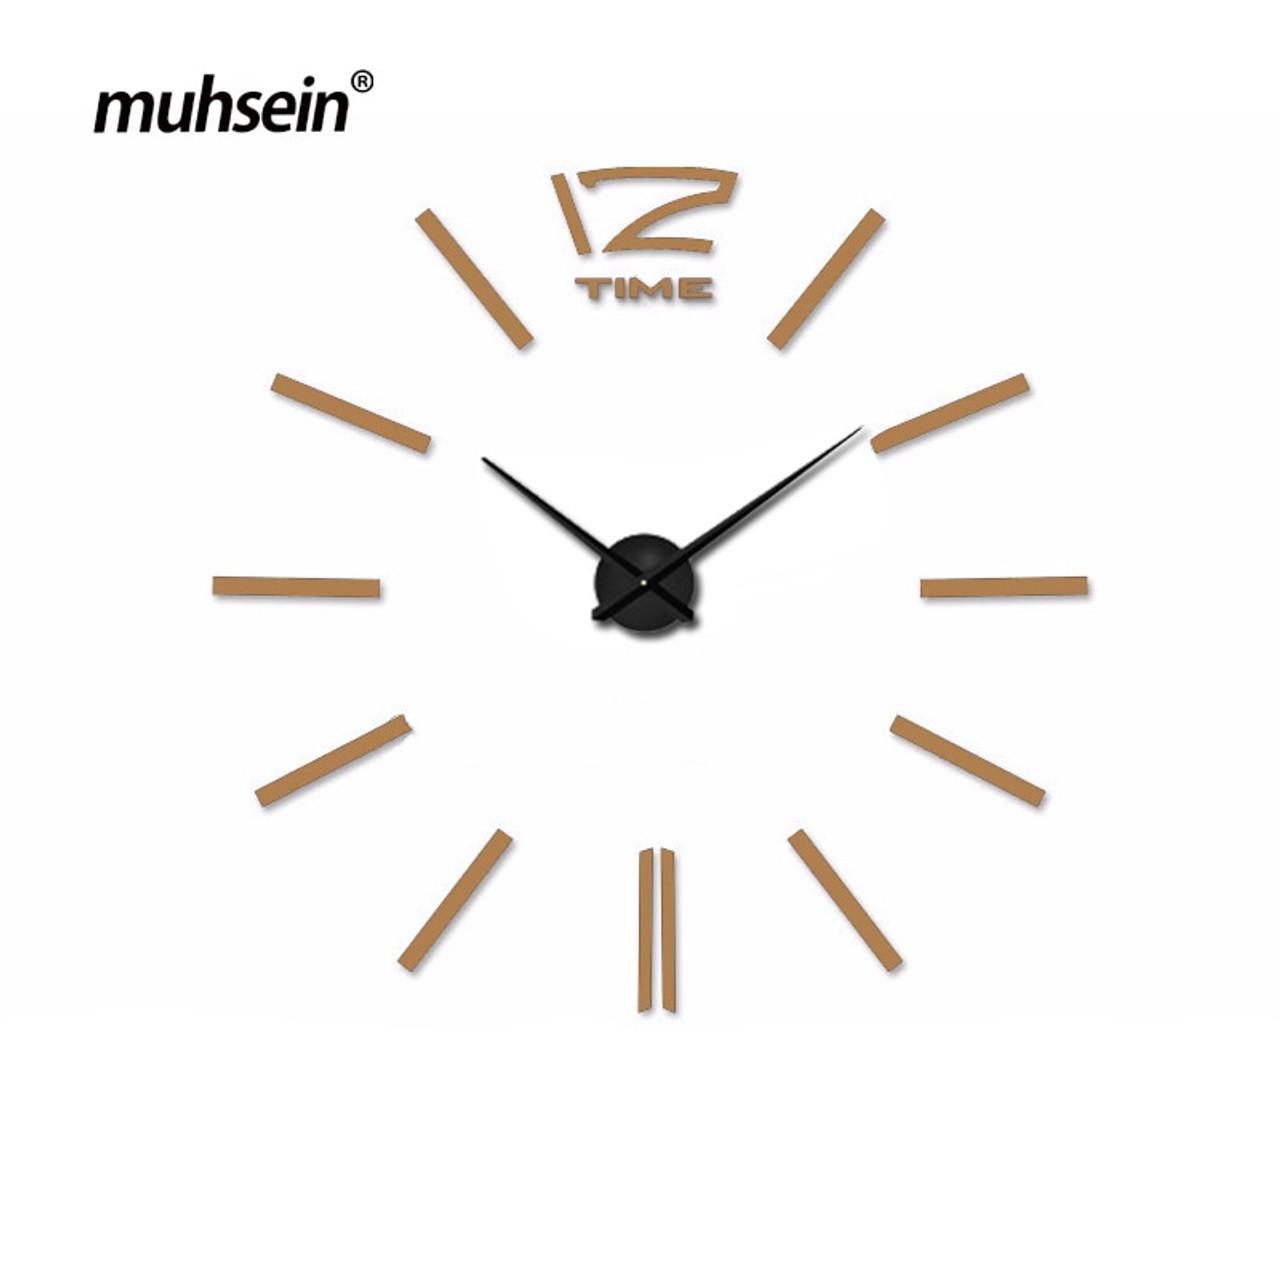 muhsein 2018 new arrivals wall clocks creative modern wall stickers